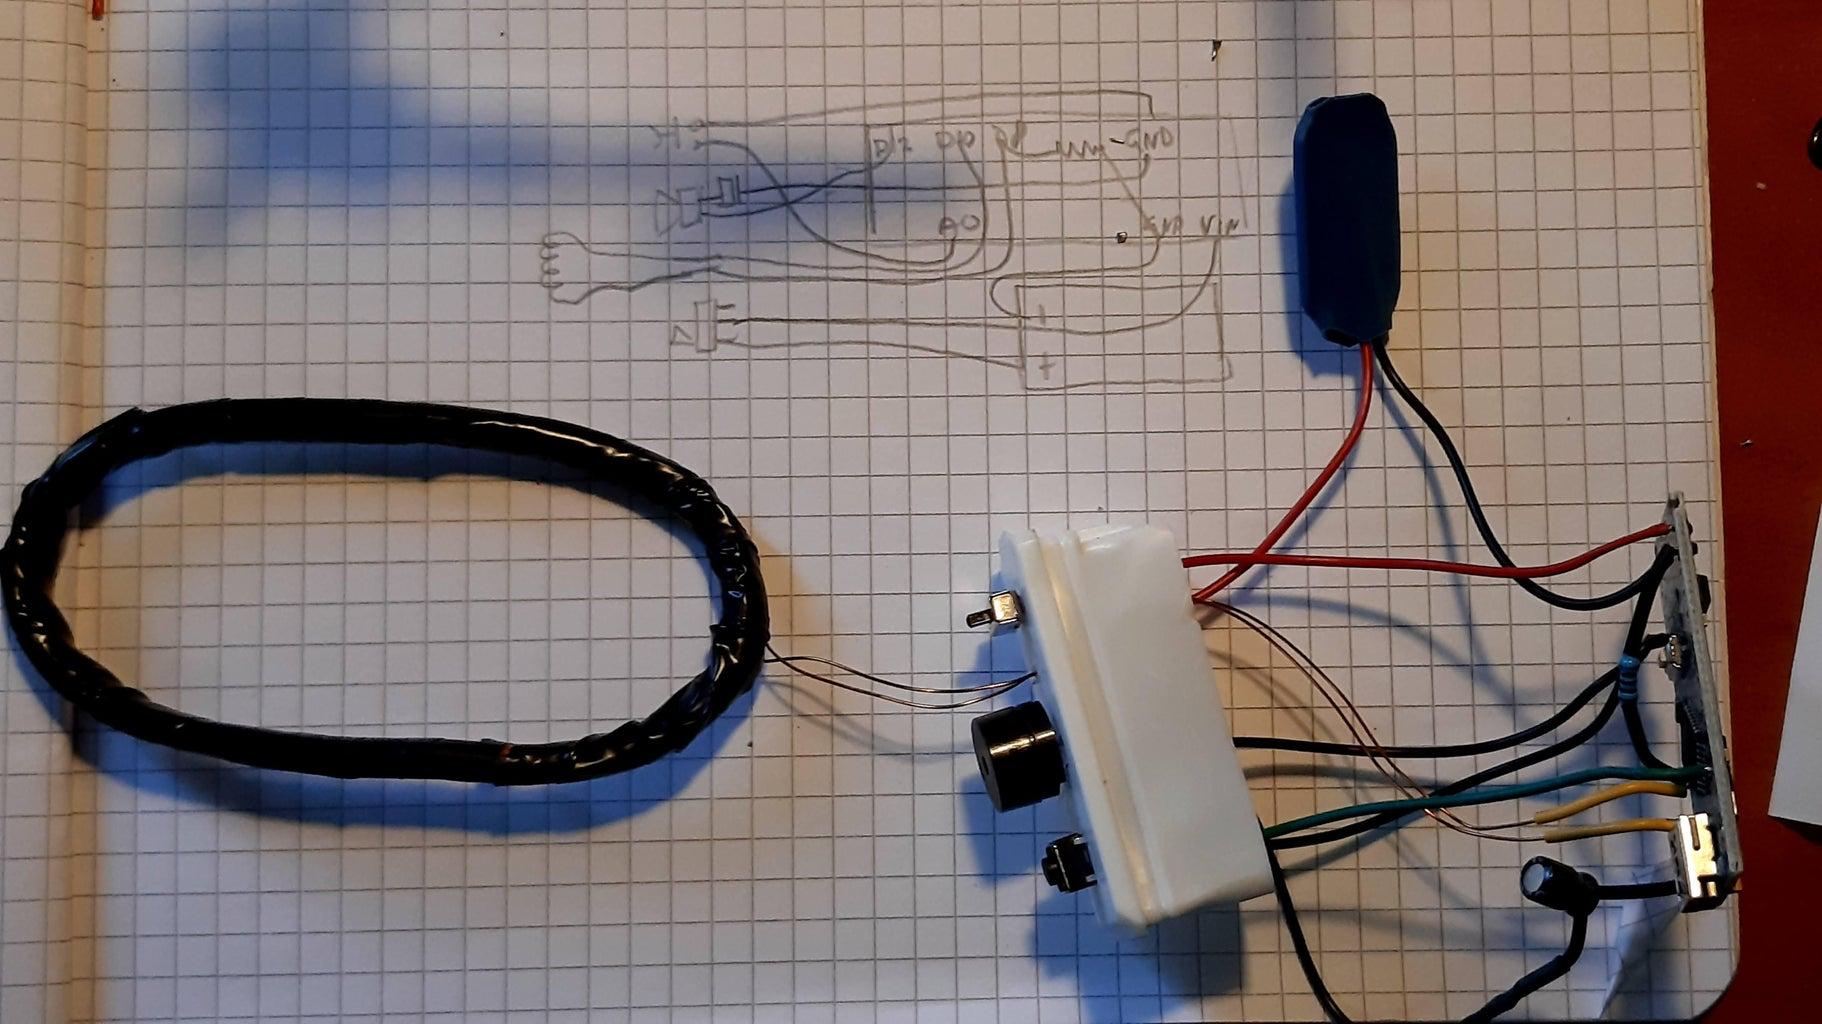 Make a Hand-held Device